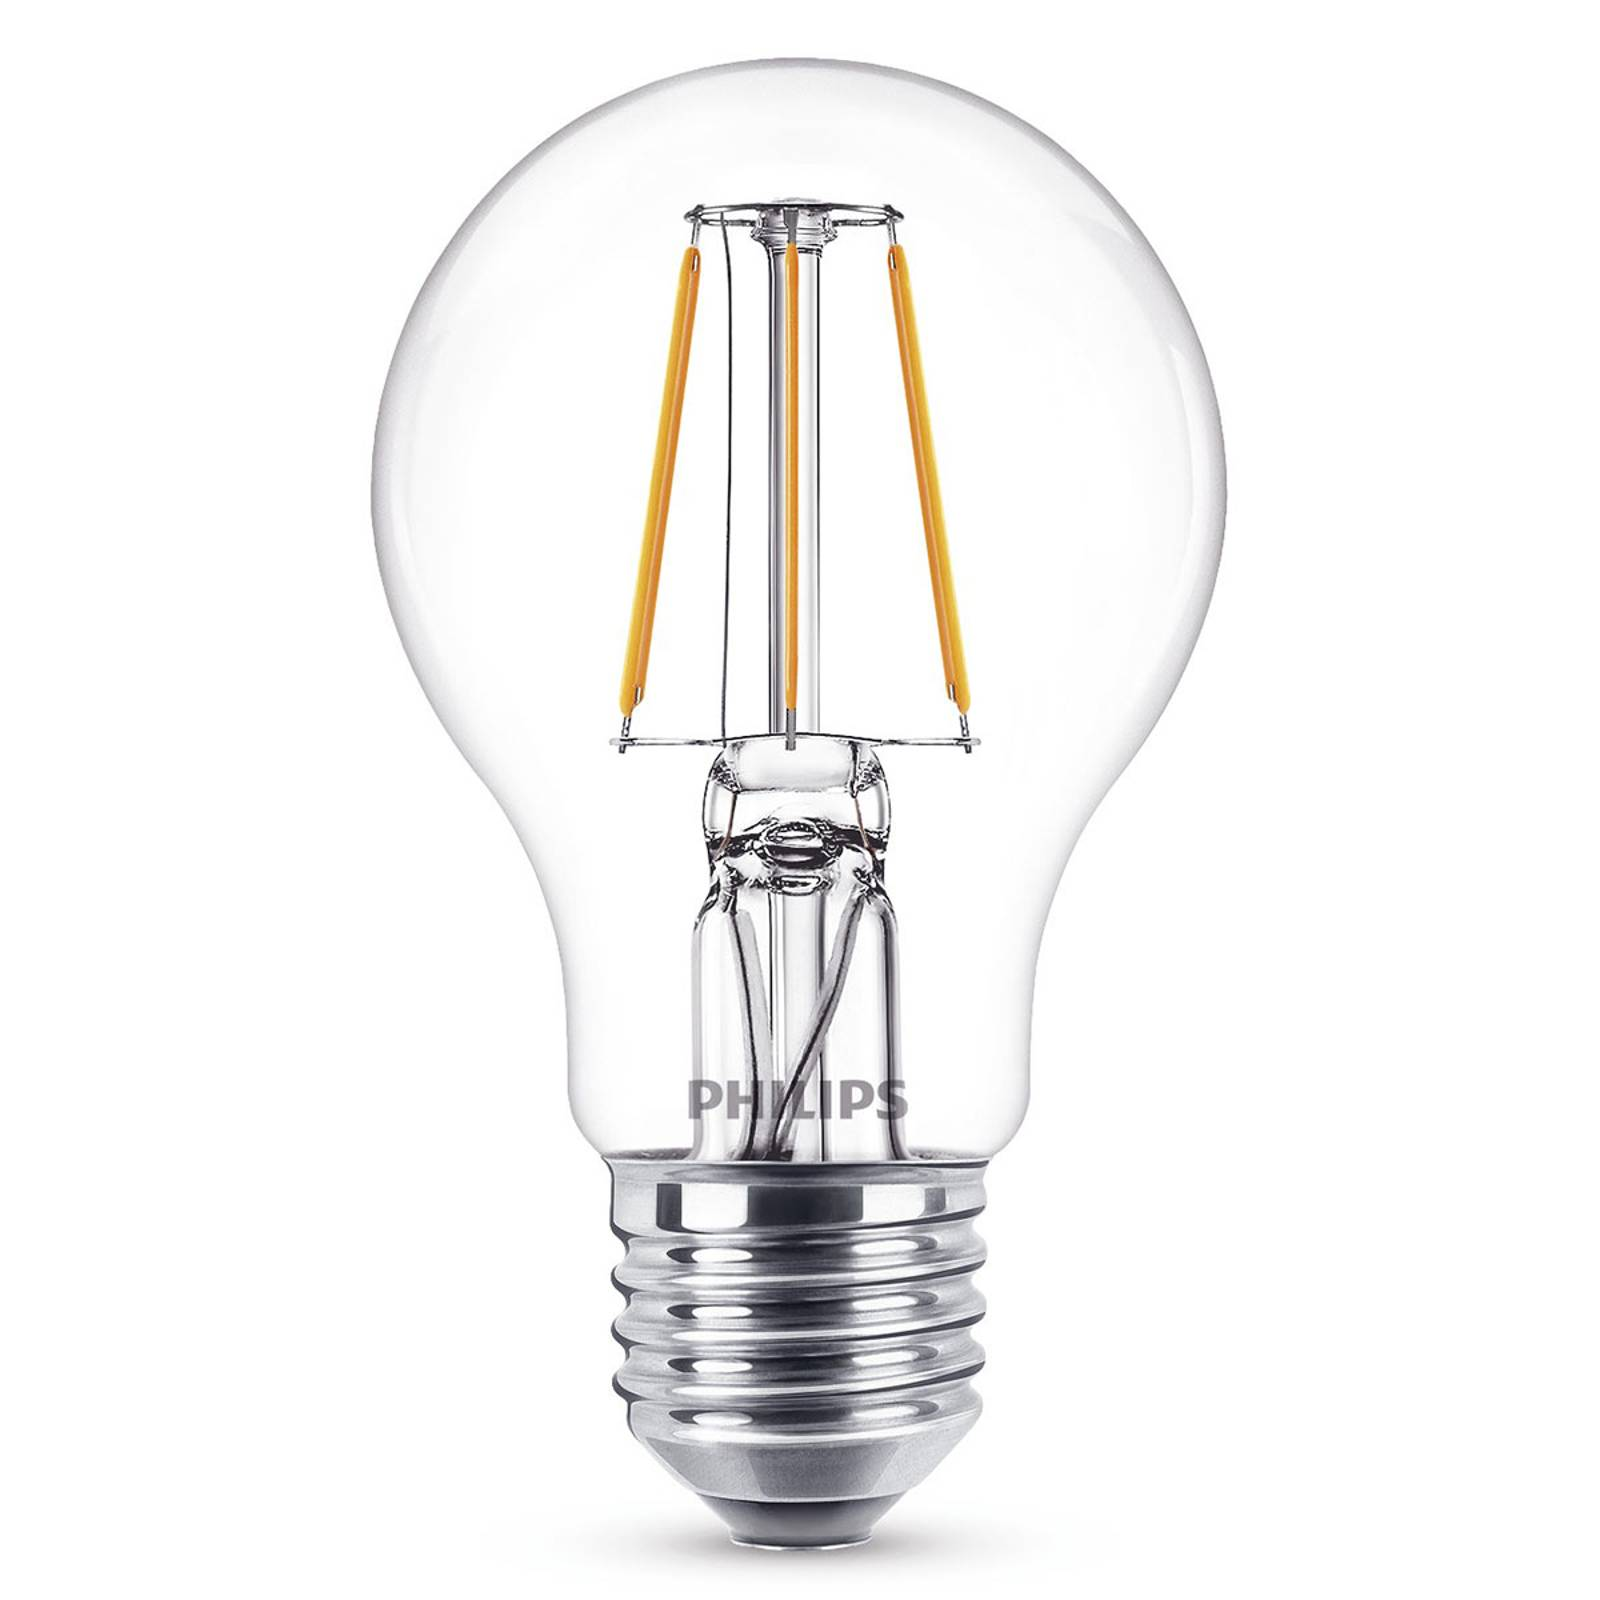 E27 A60 -LED-filamenttilamppu 4 W, 2 700 K, kirkas